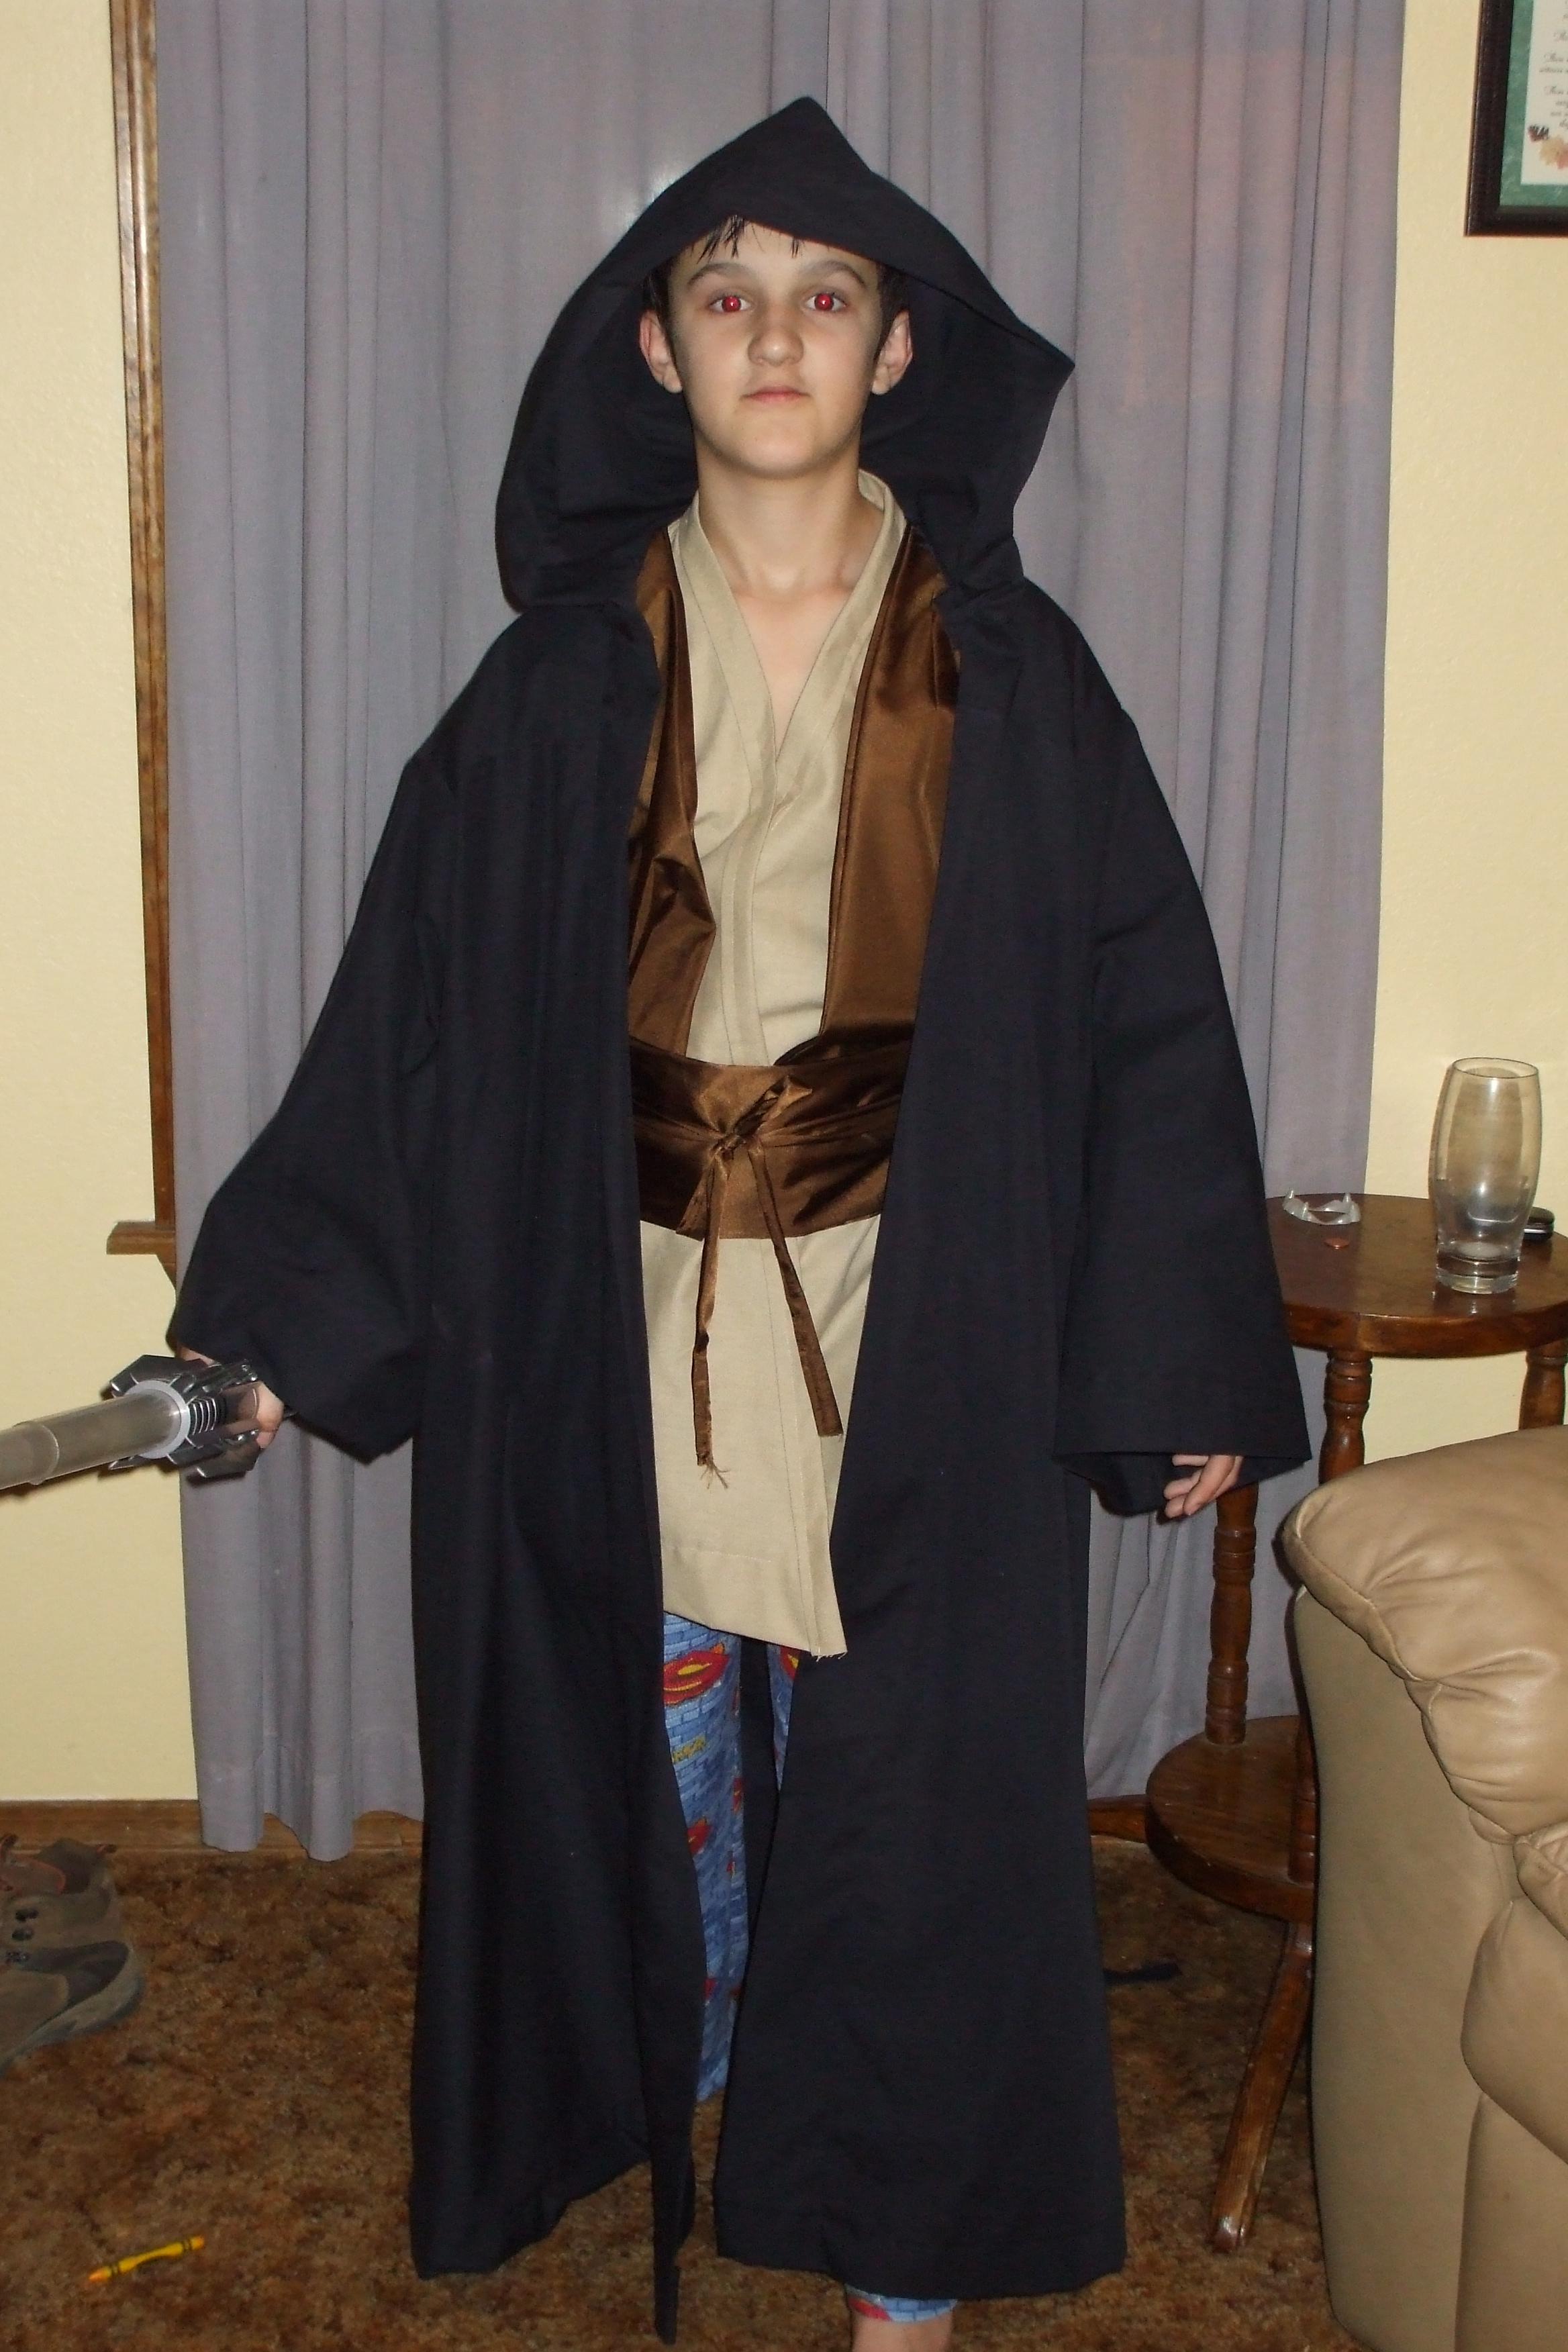 Help me Matthew-Wan Kenobi, you're our only hope